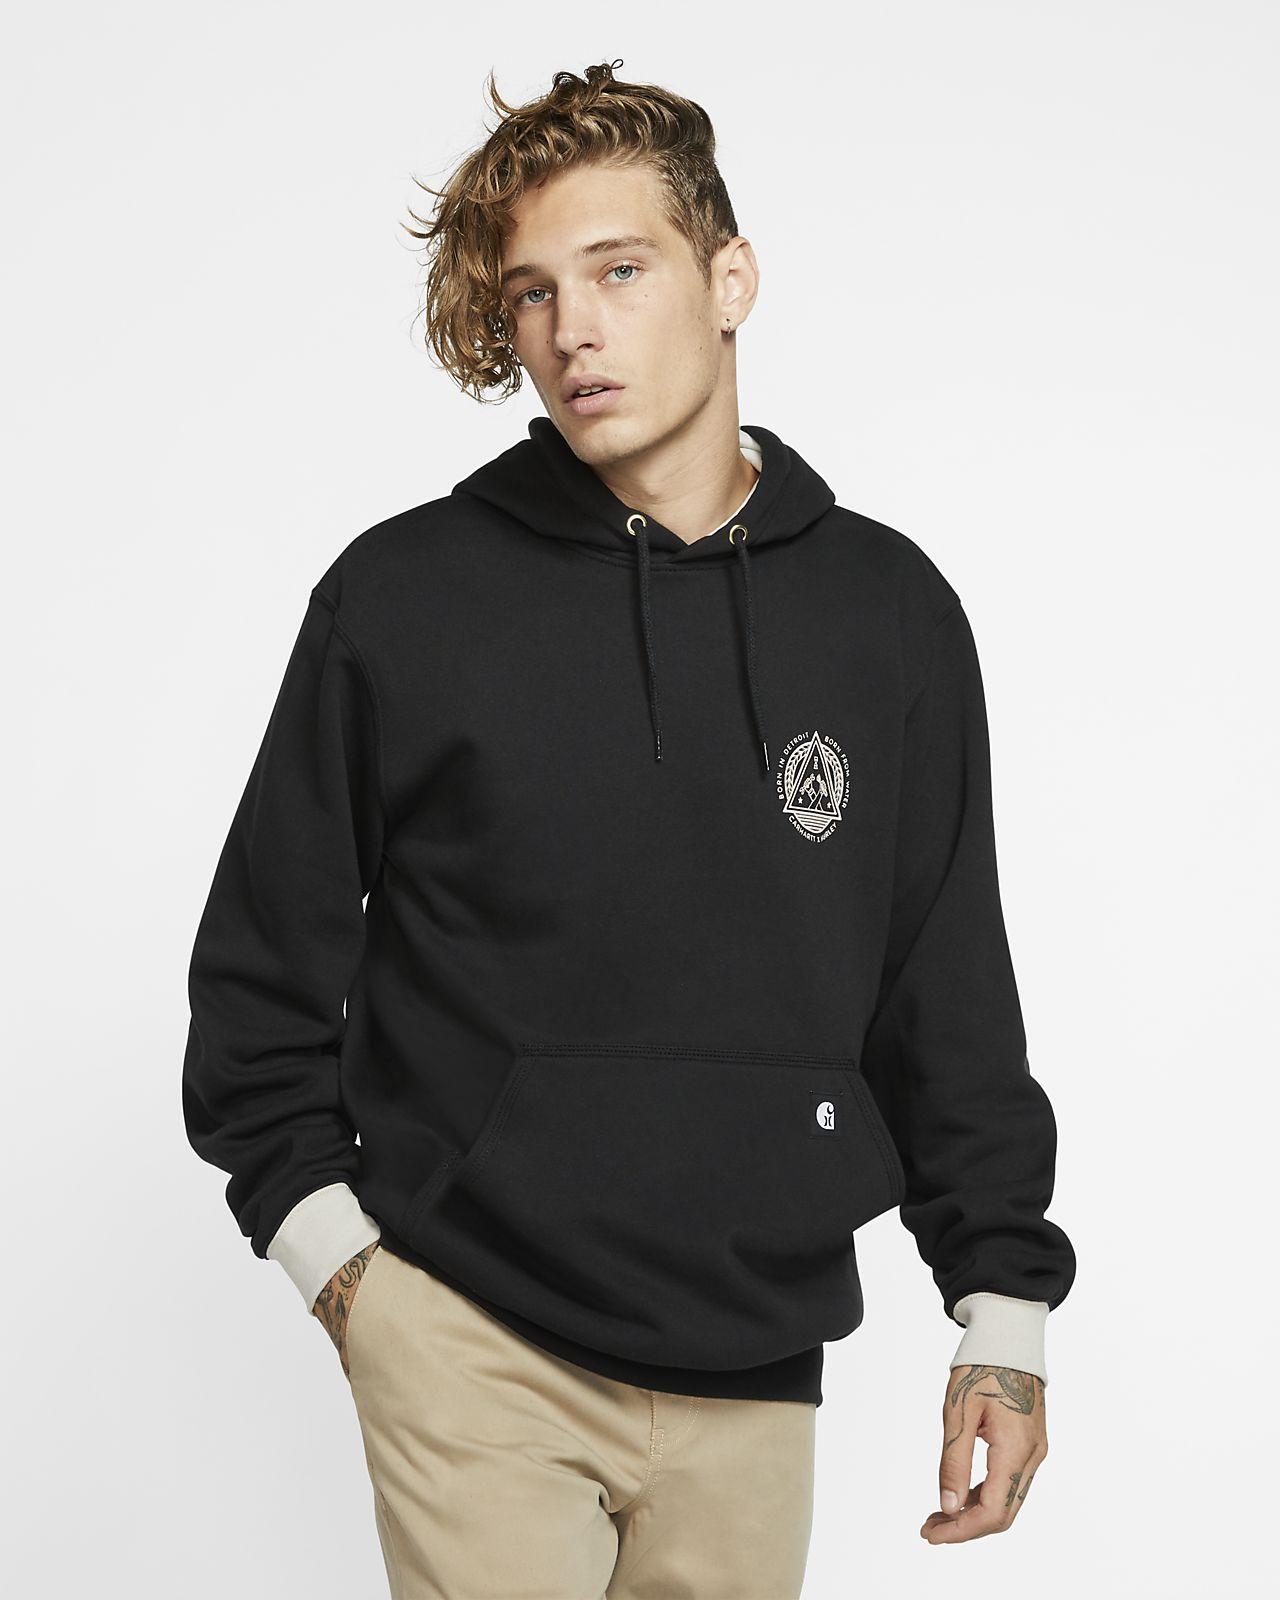 Hurley x Carhartt CMDT Men's Fleece Pullover